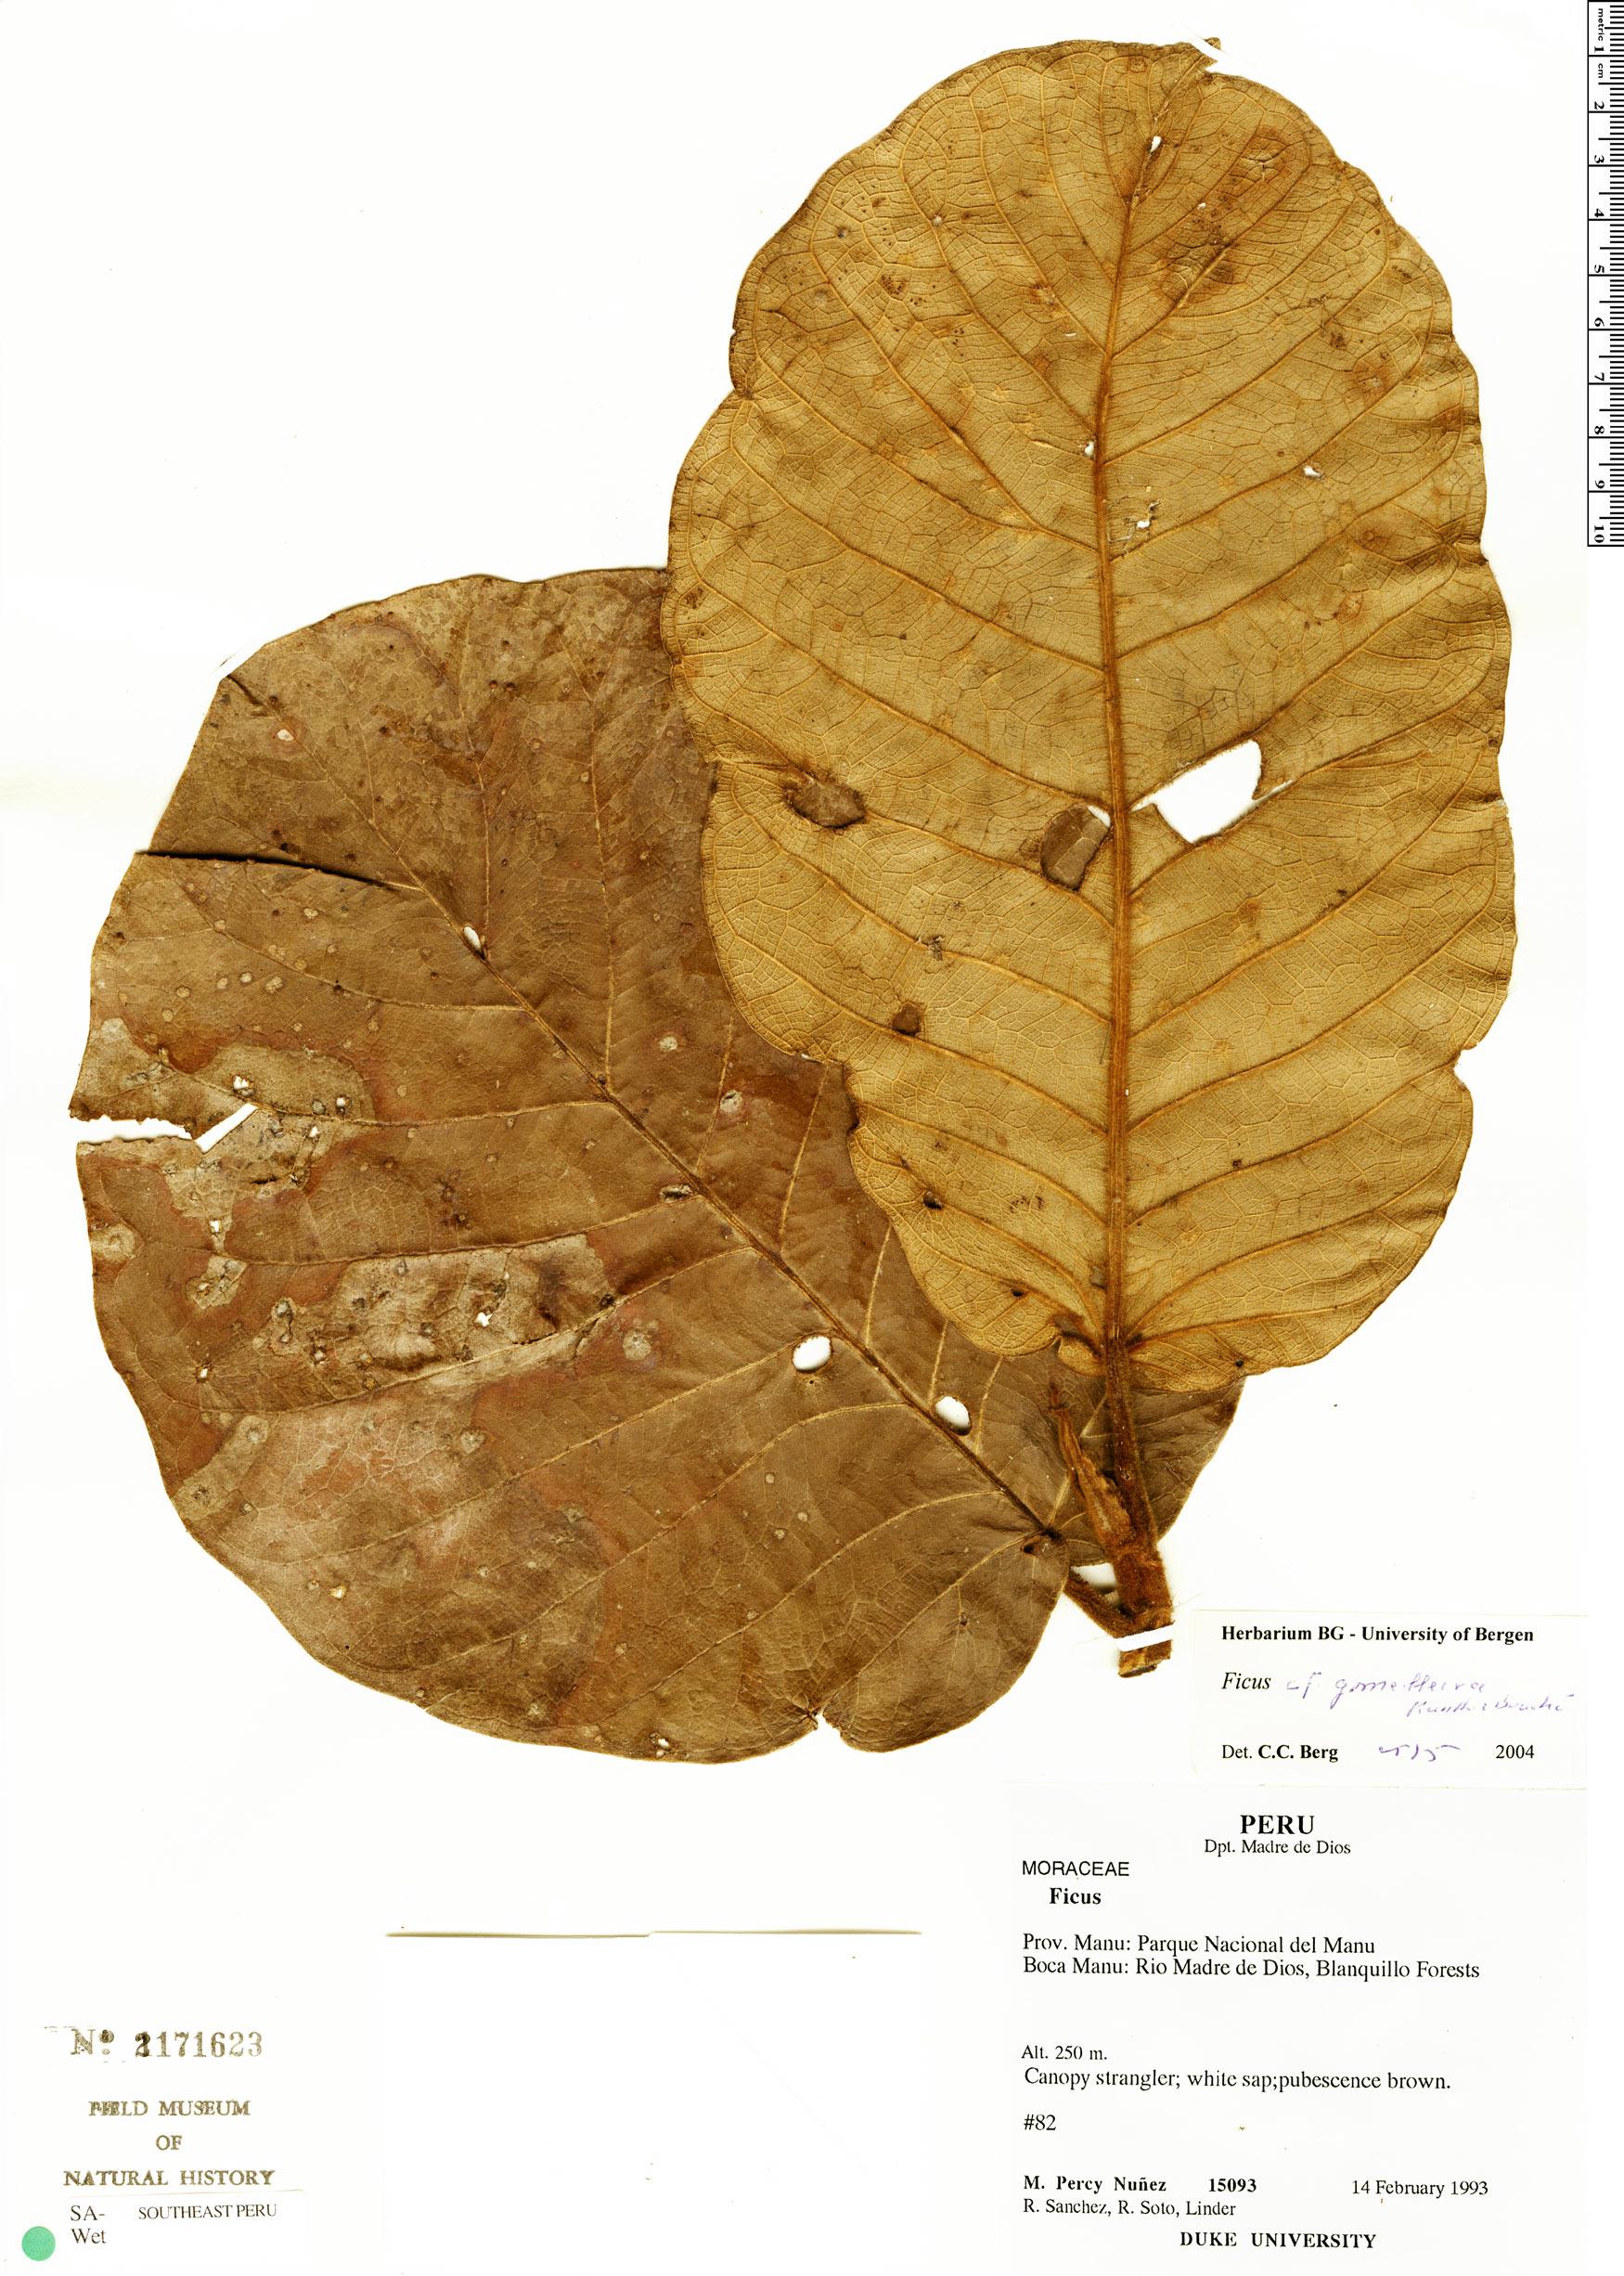 Specimen: Ficus gomelleira